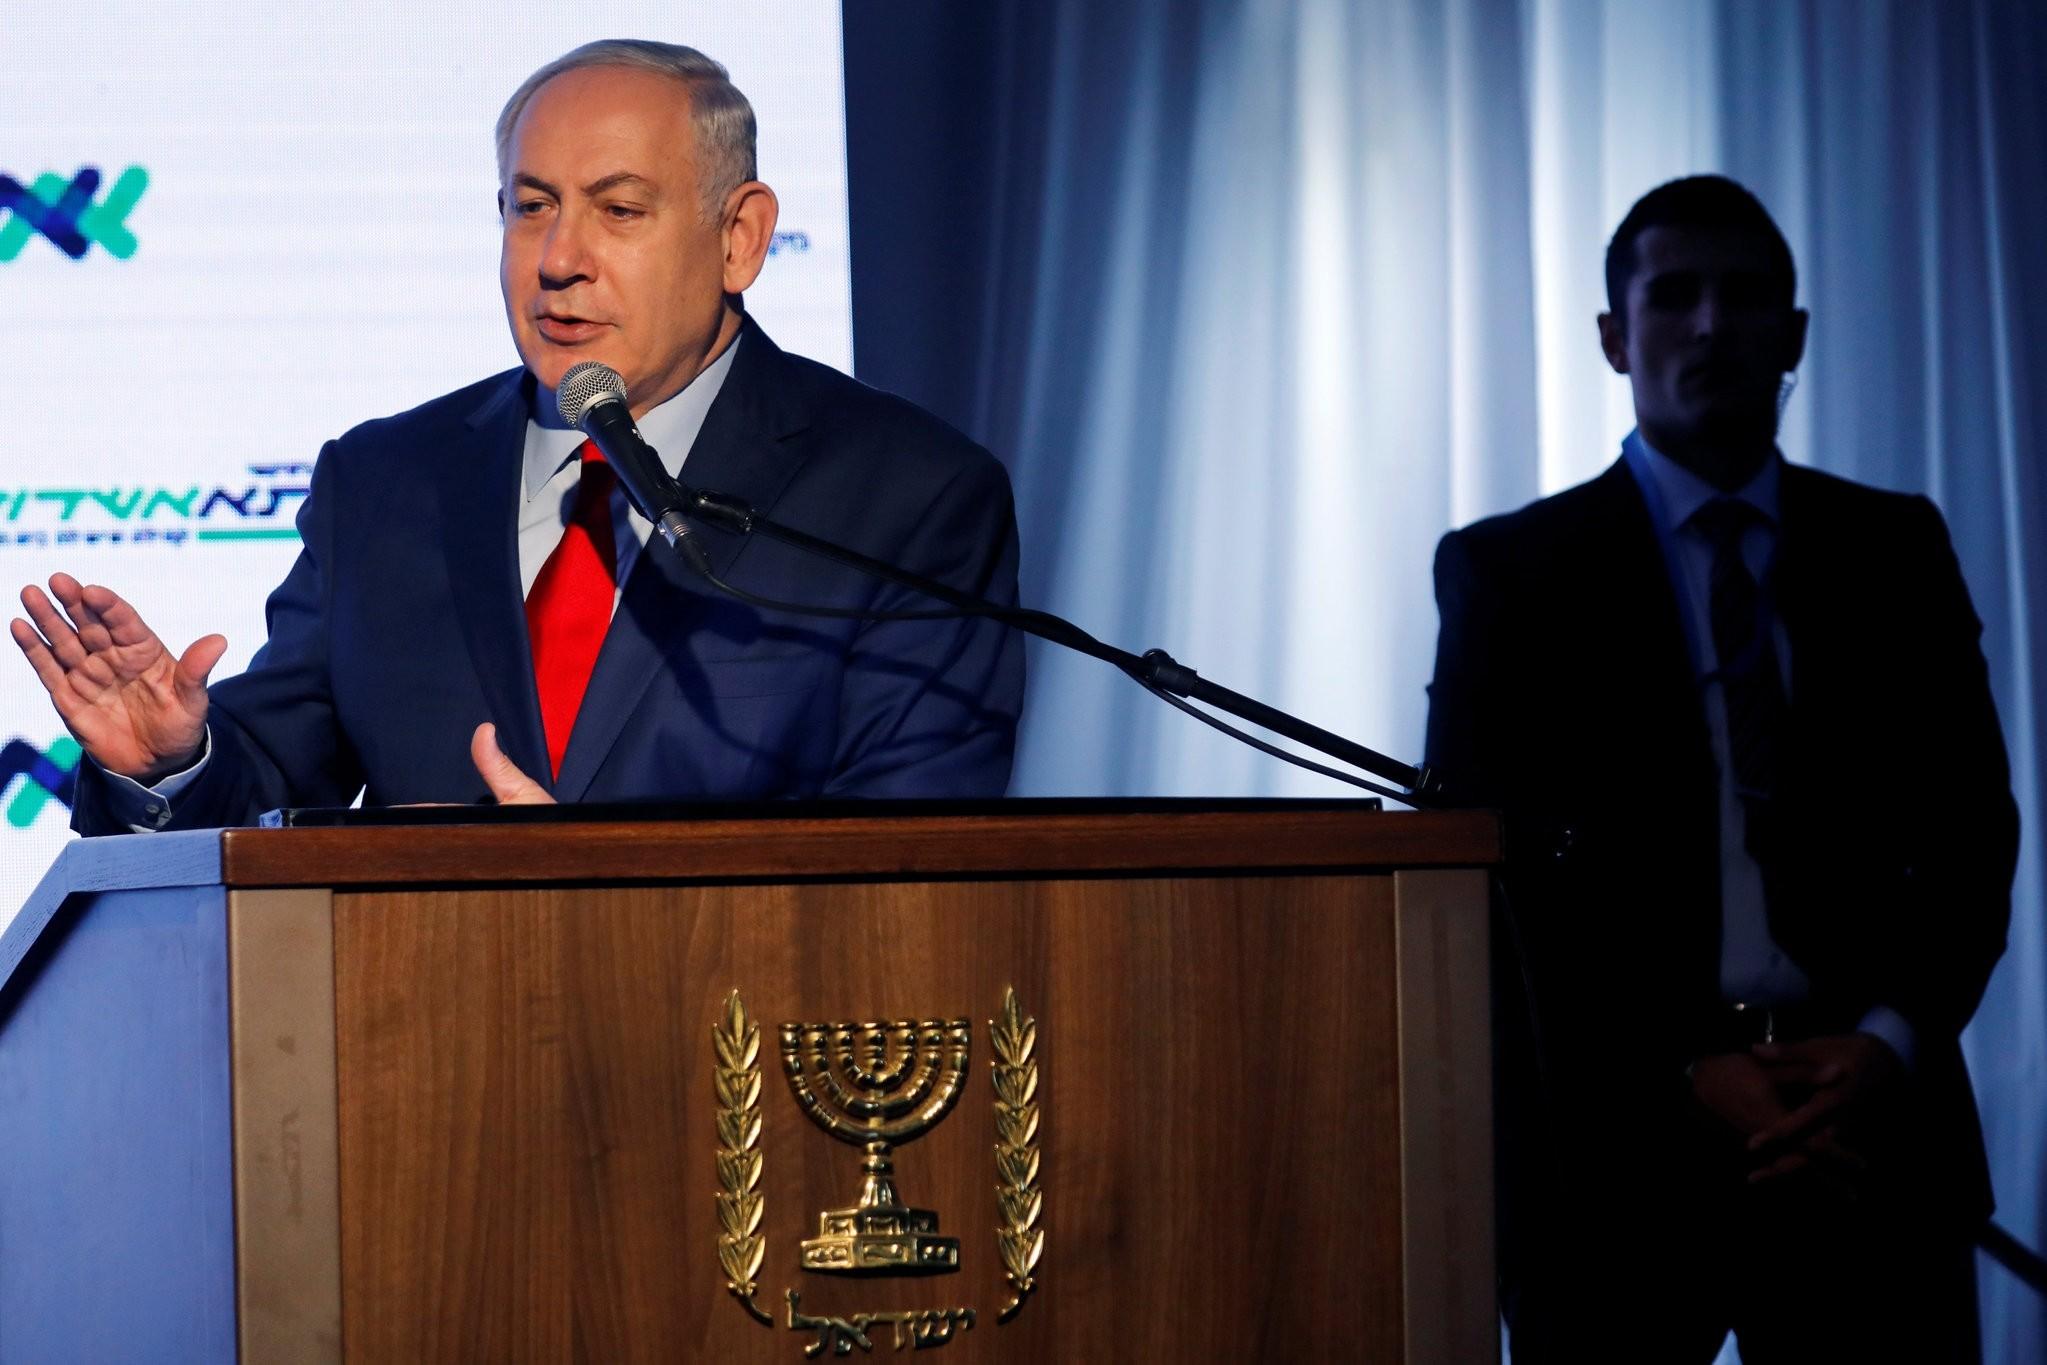 Israeli Prime Minister Benjamin Netanyahu speaks during a dedication ceremony of the ,Assuta, hospital in Ashdod, Israel December 21, 2017. (REUTERS Photo)